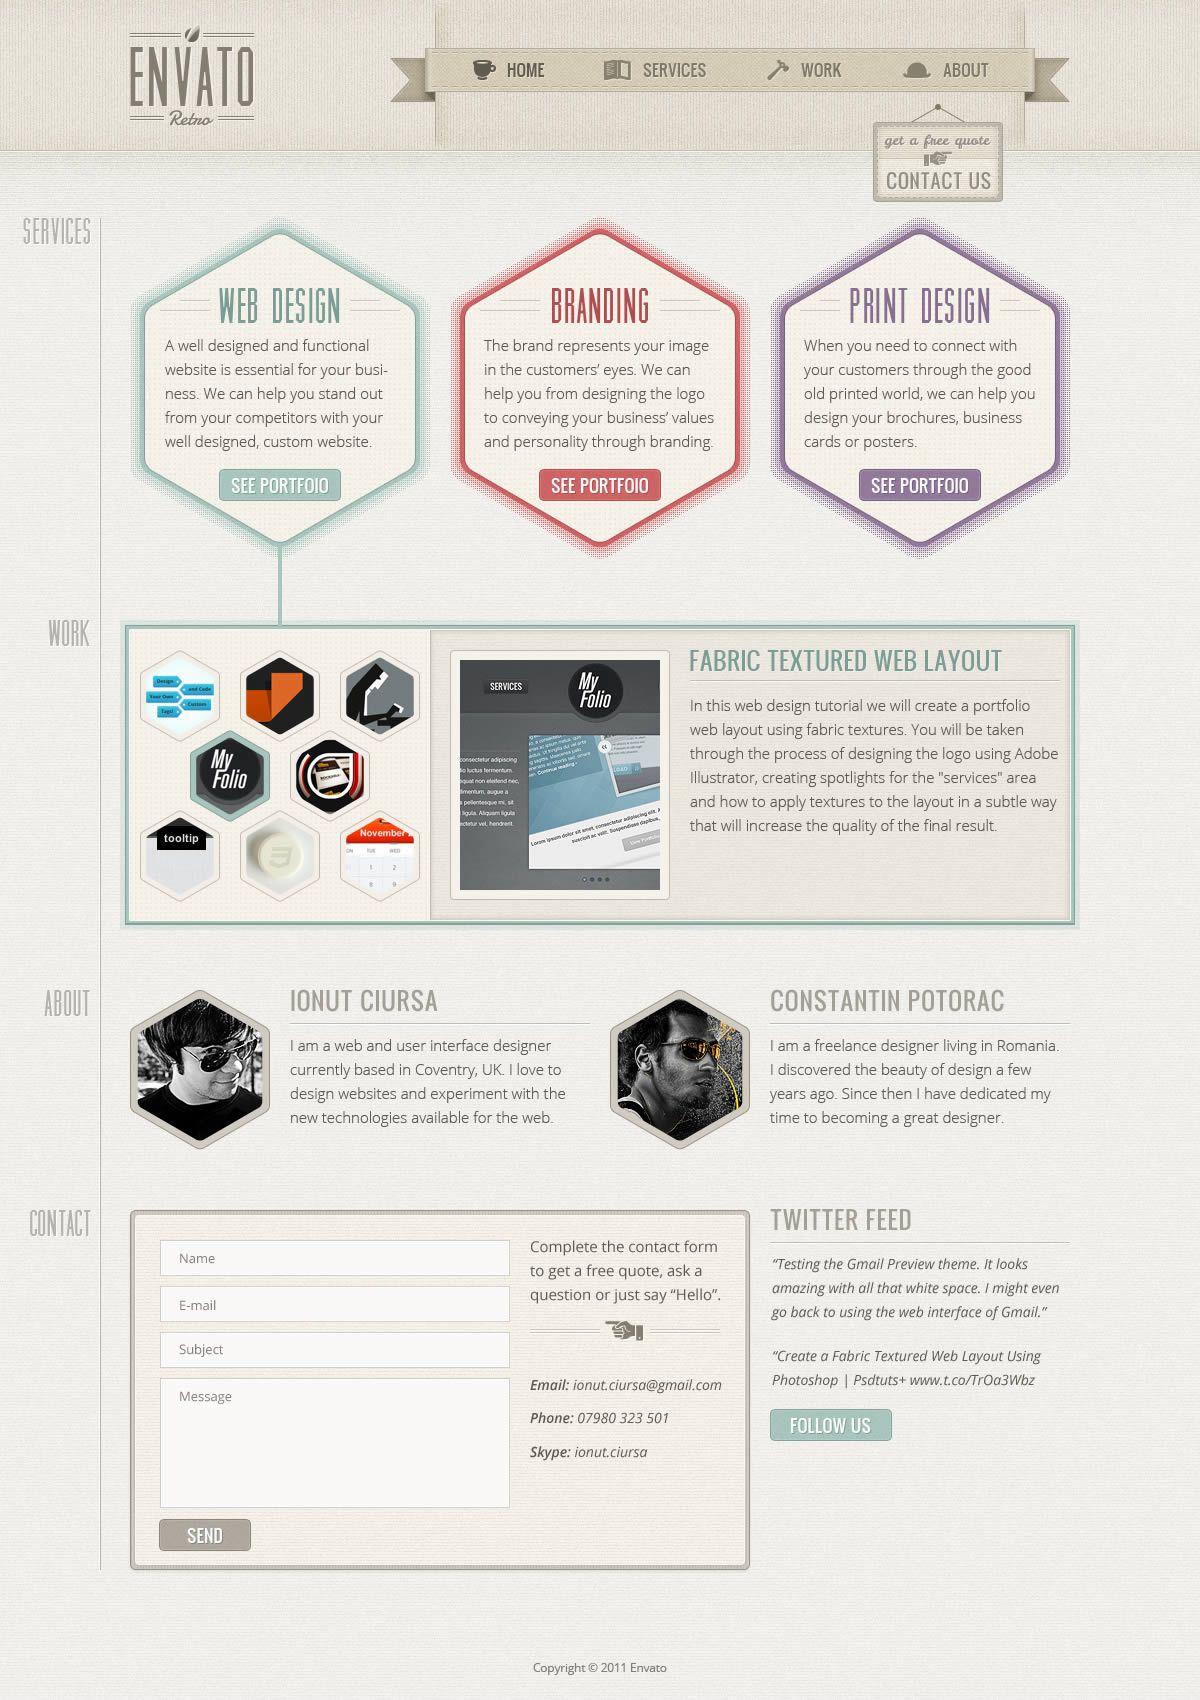 48 excellent tutorials for designing websites in photoshop | web.